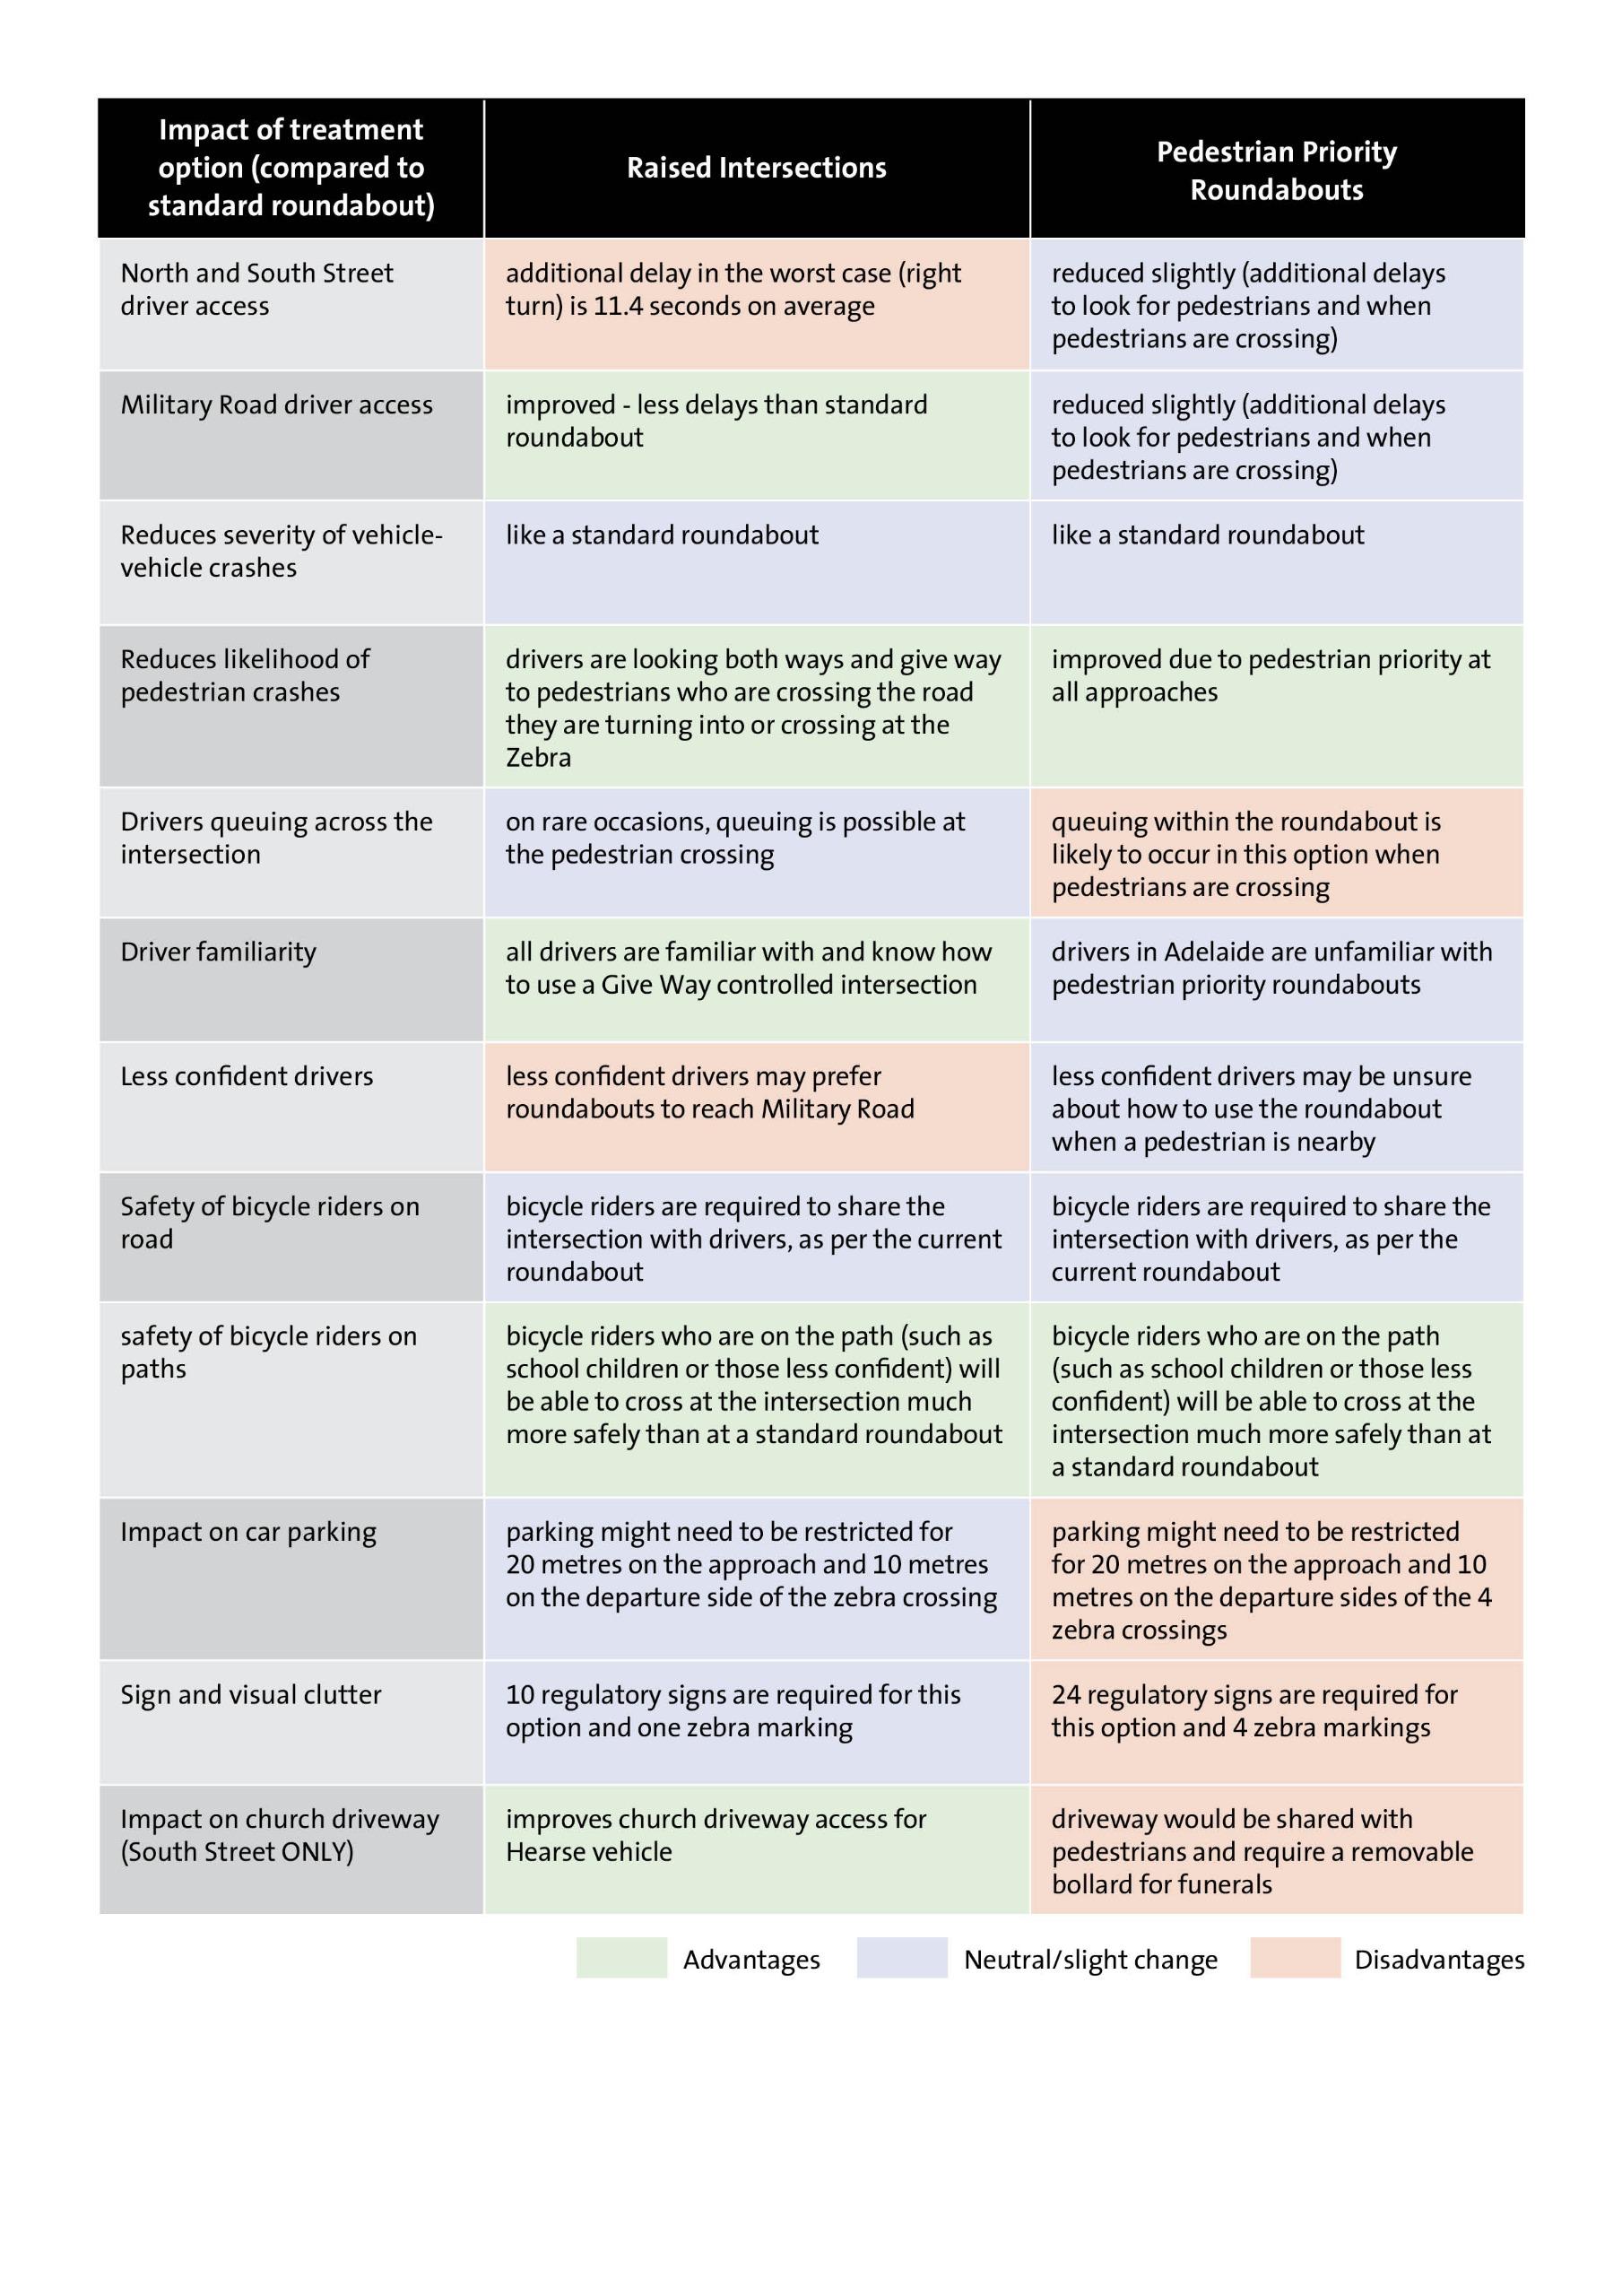 Impact of treatment options